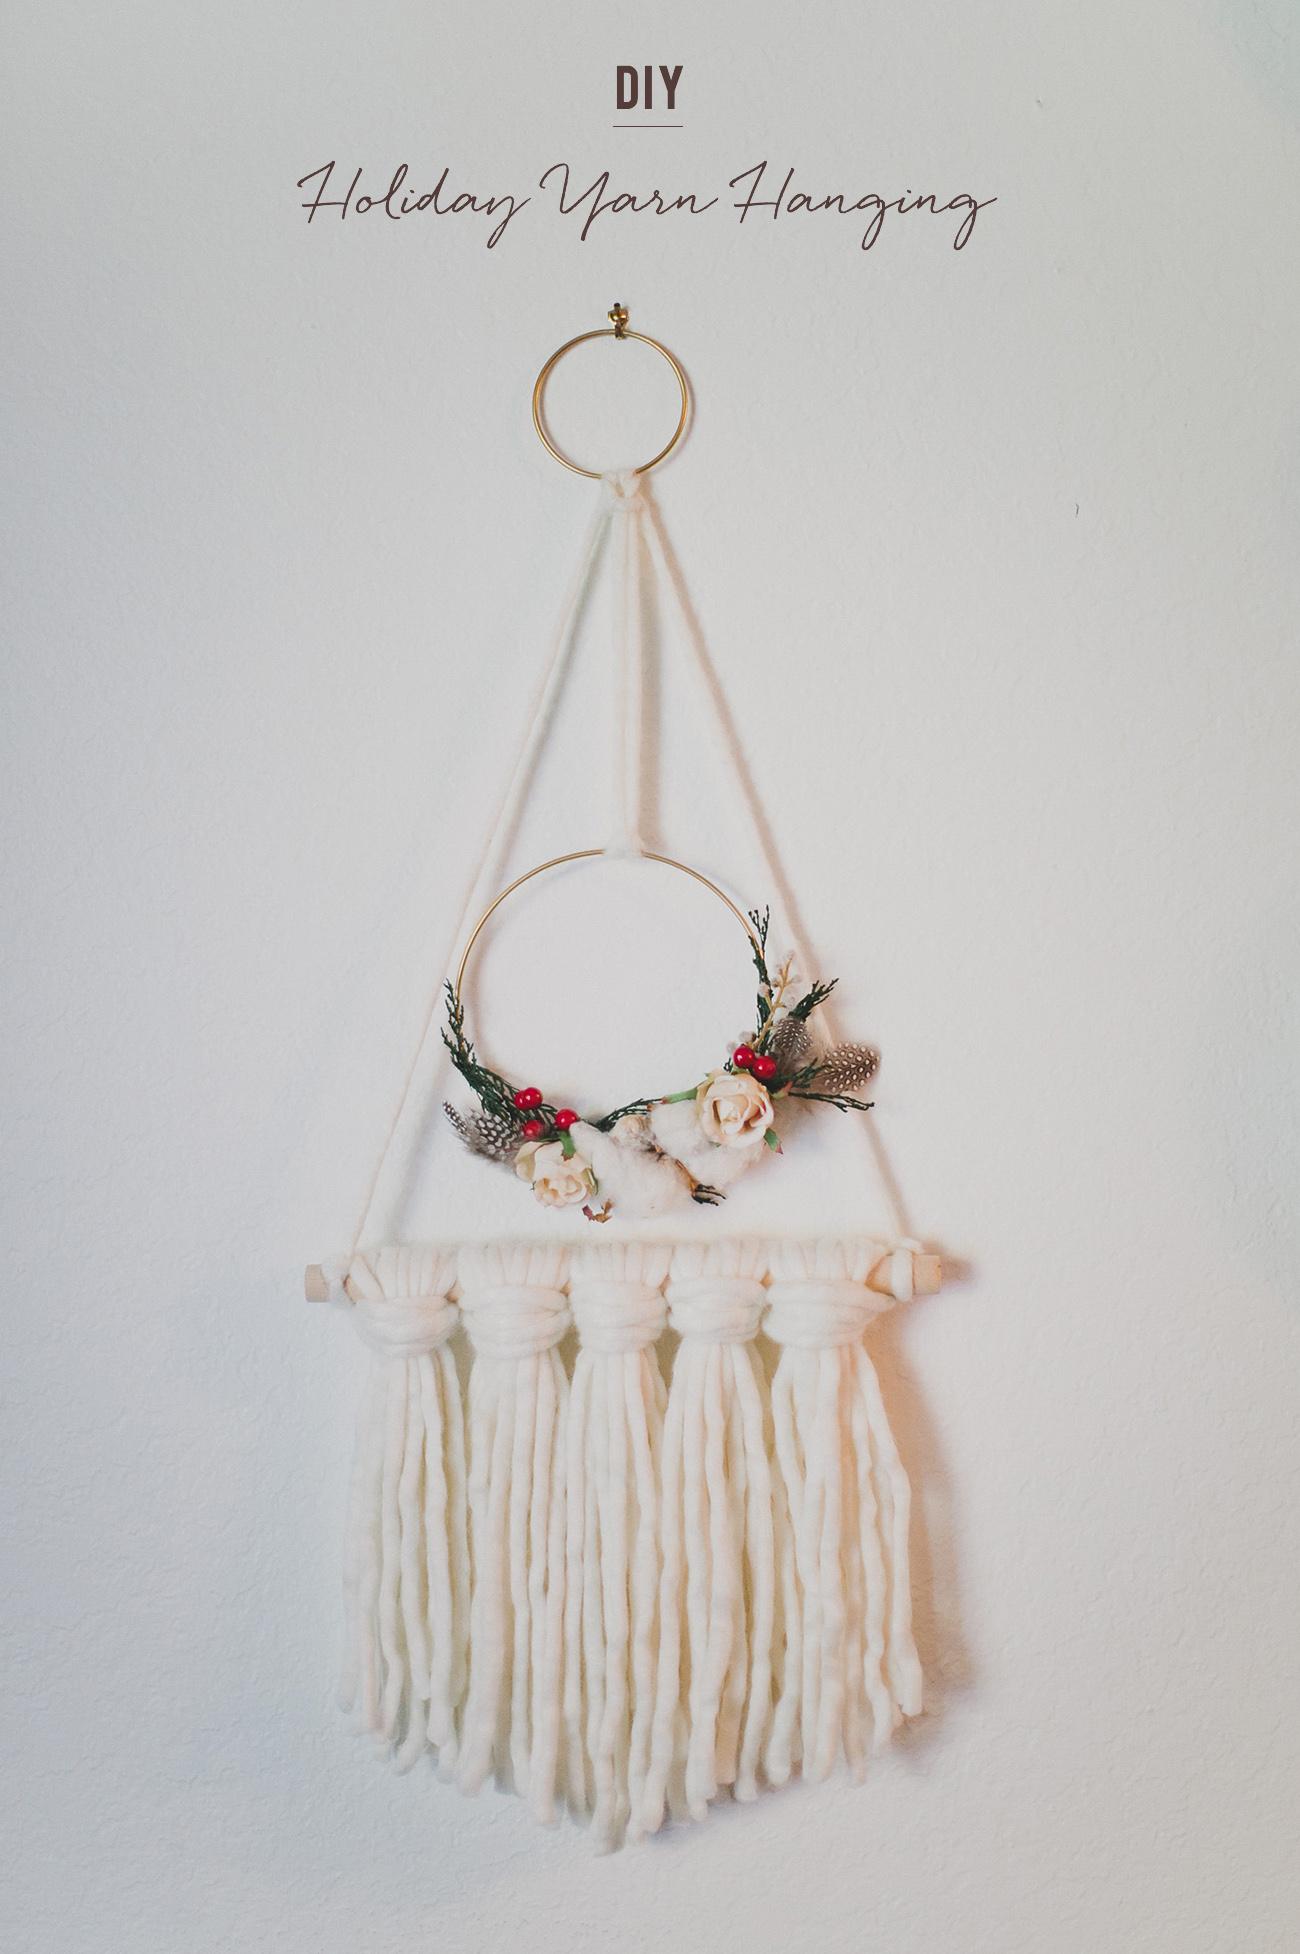 holiday yarn hanging DIY